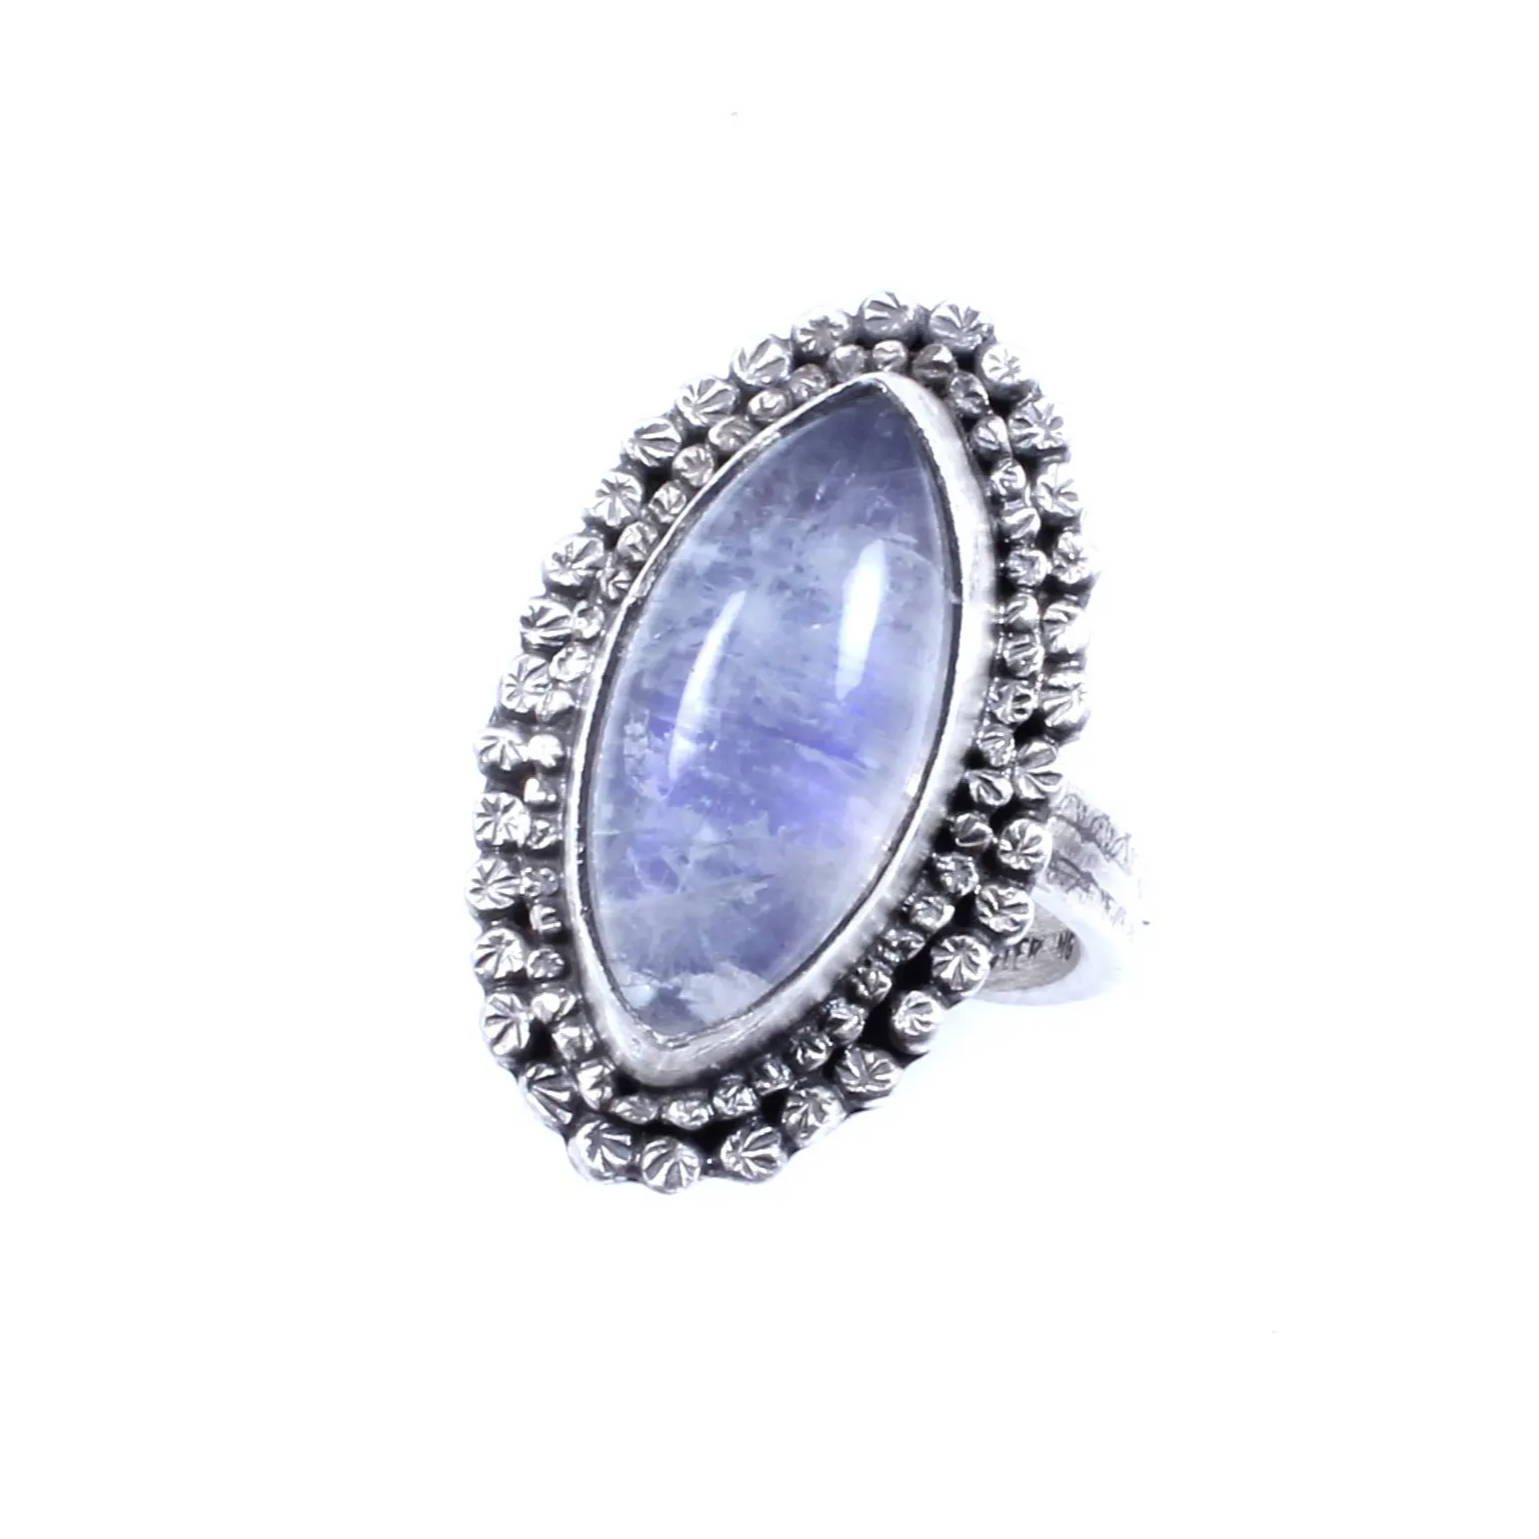 Lawrence Baca Rings. online jewelry sale. santa fe jewelry spanish jewelry sorrel sky gallery